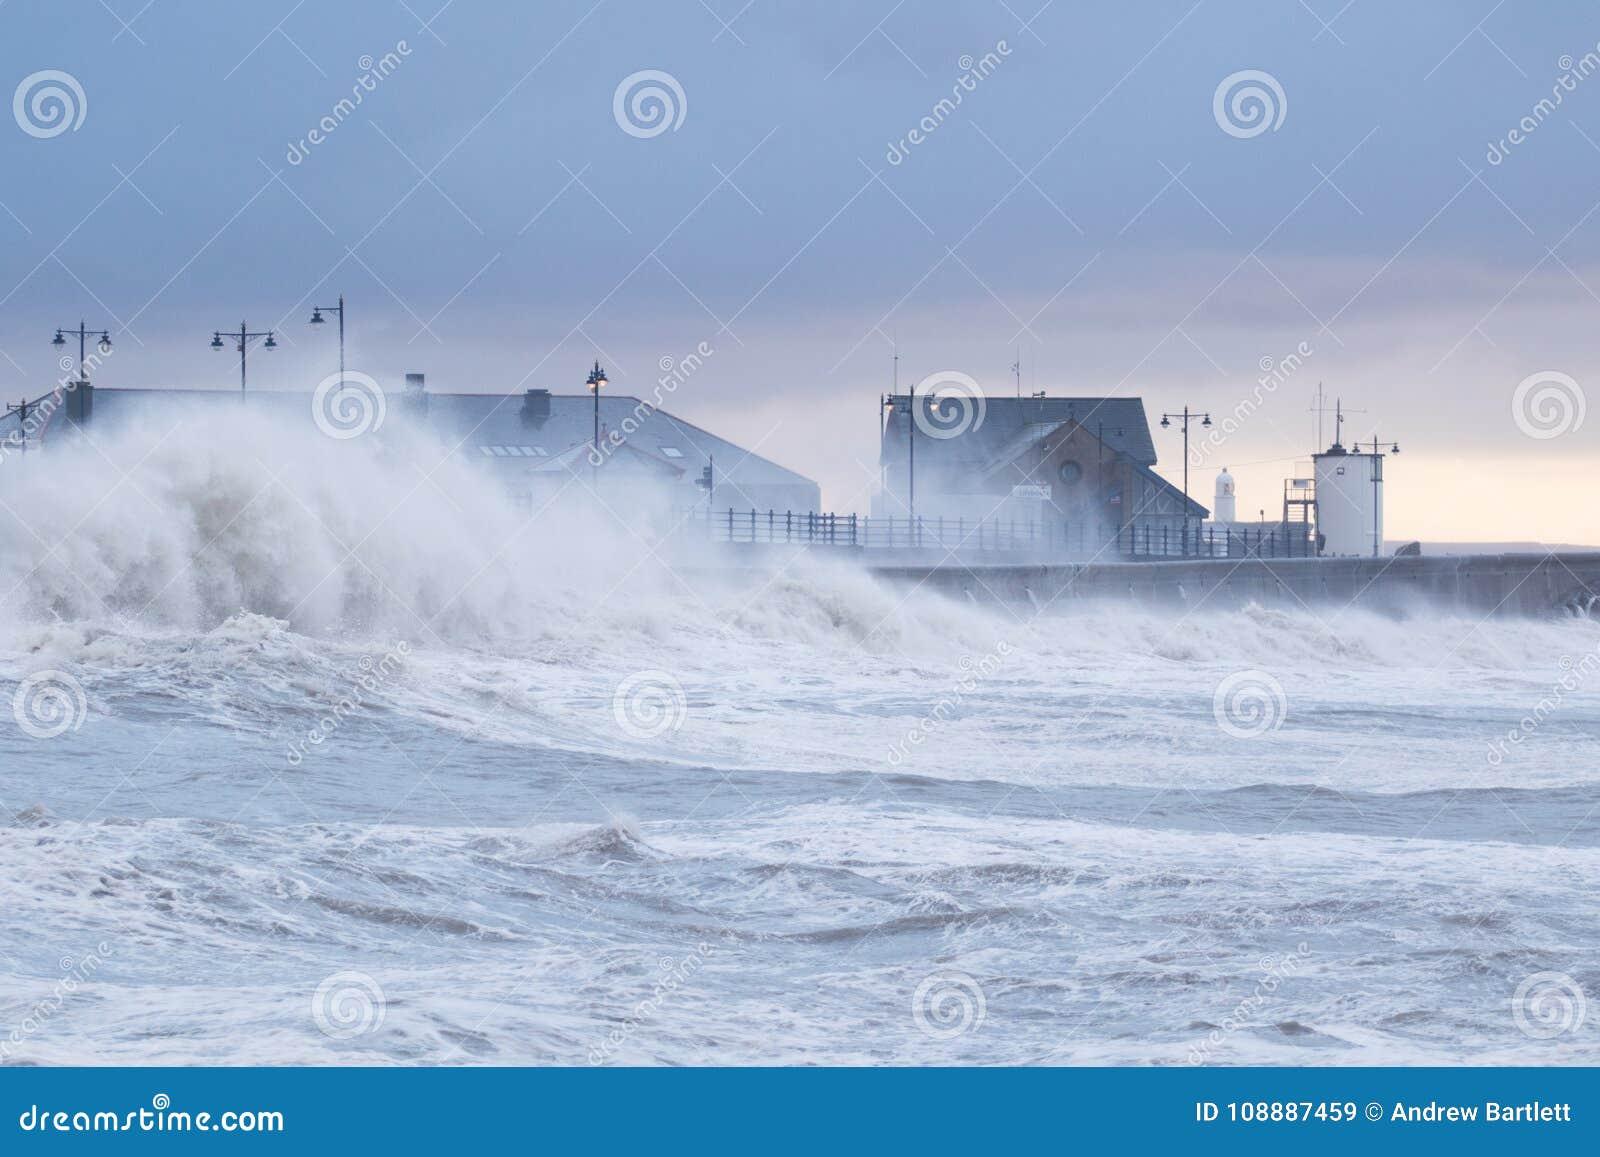 Stormy seas at Porthcawl, South Wales, UK.